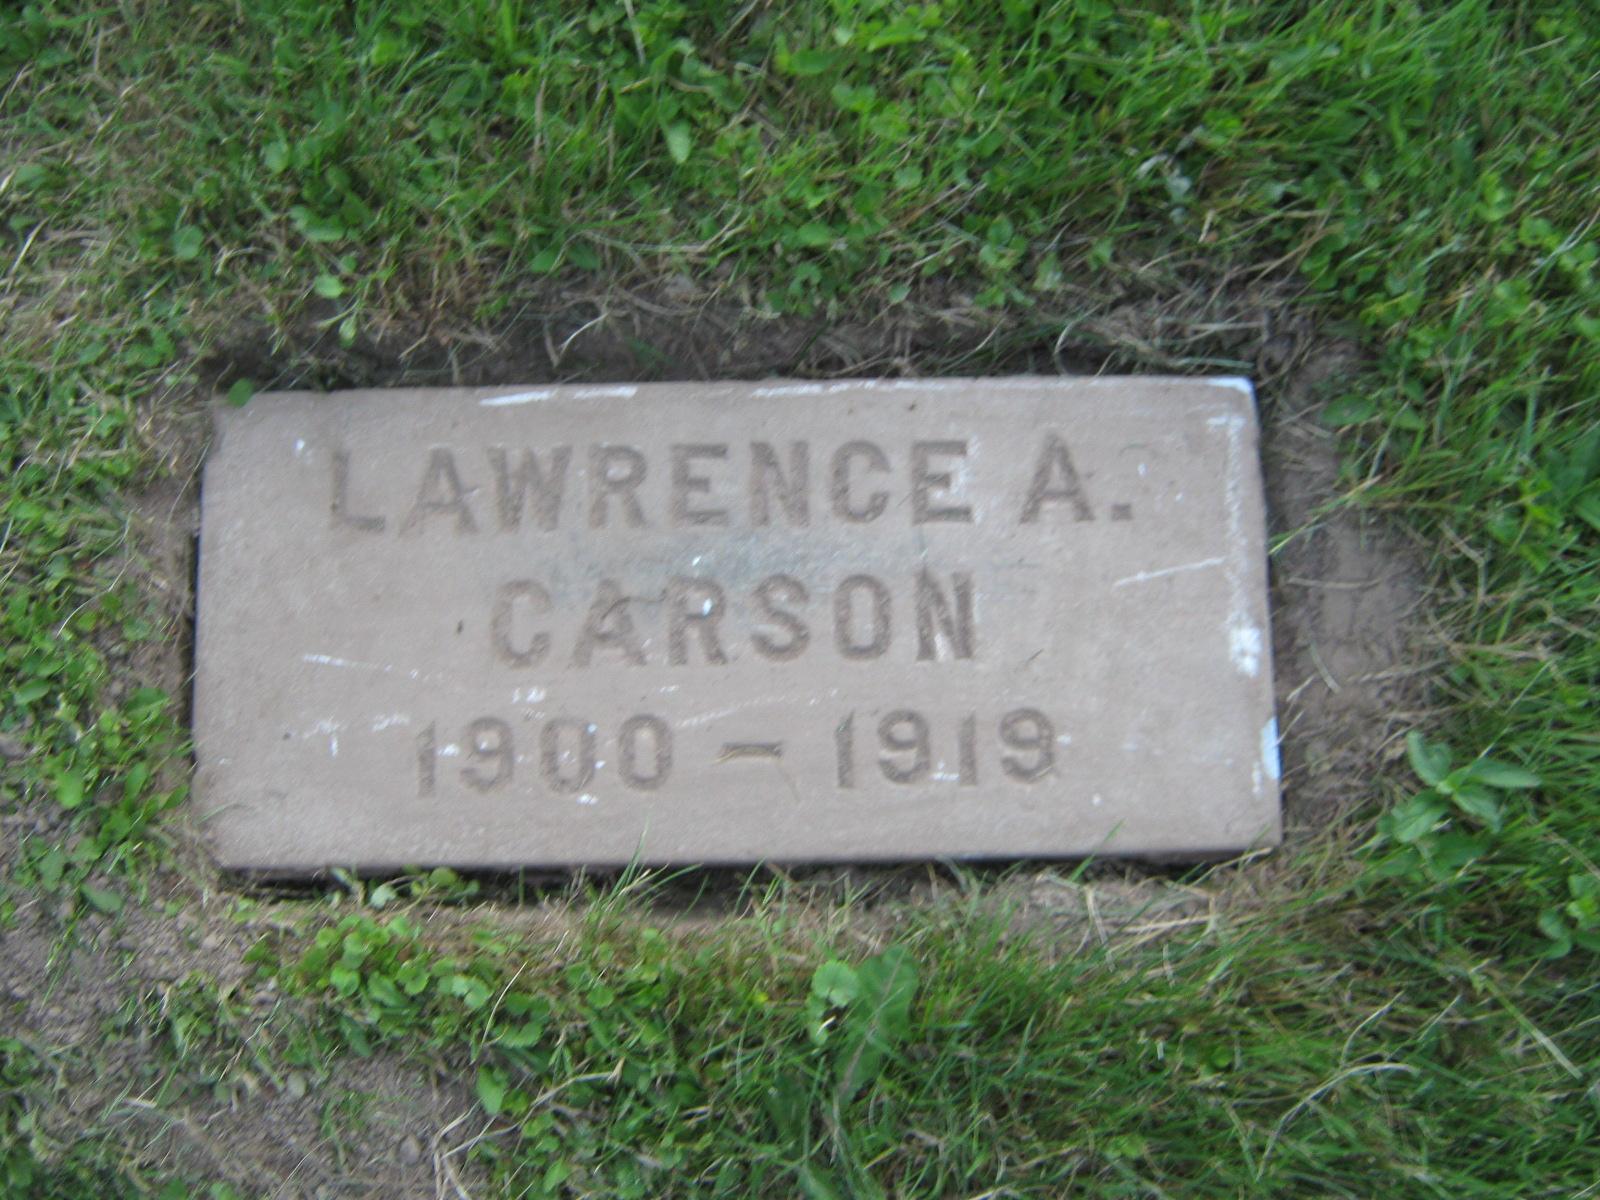 Lawrence Alonzo Carson